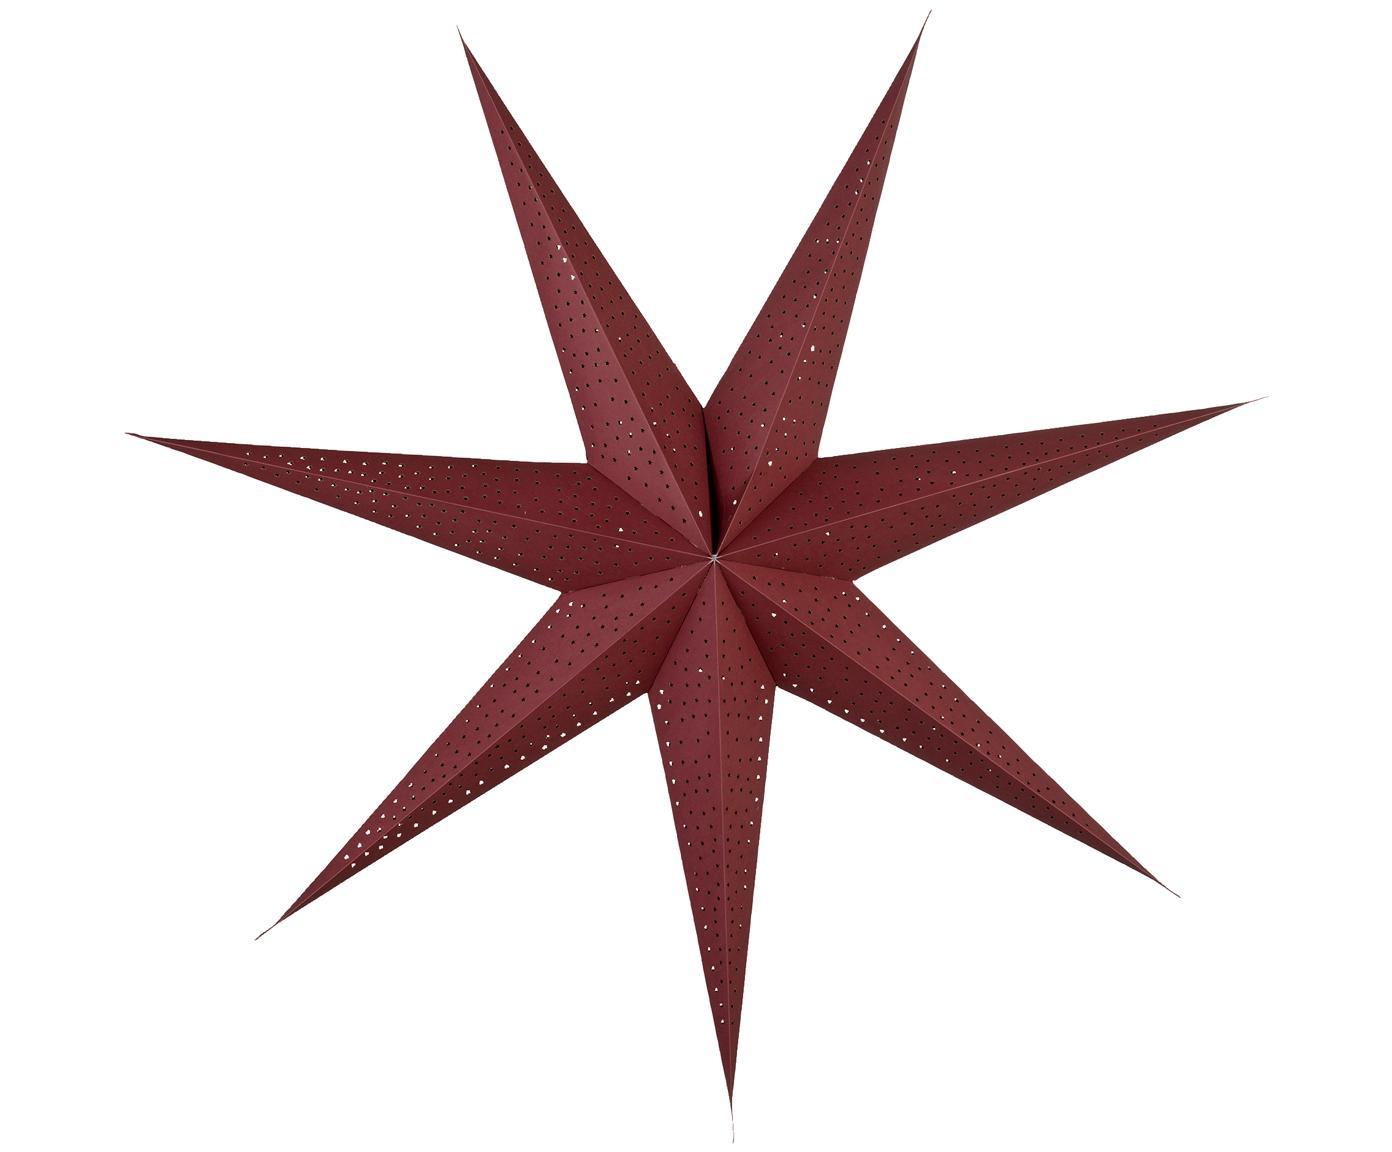 Papieren ster Icilinia, Papier, Granaatappelrood, Ø 80 cm